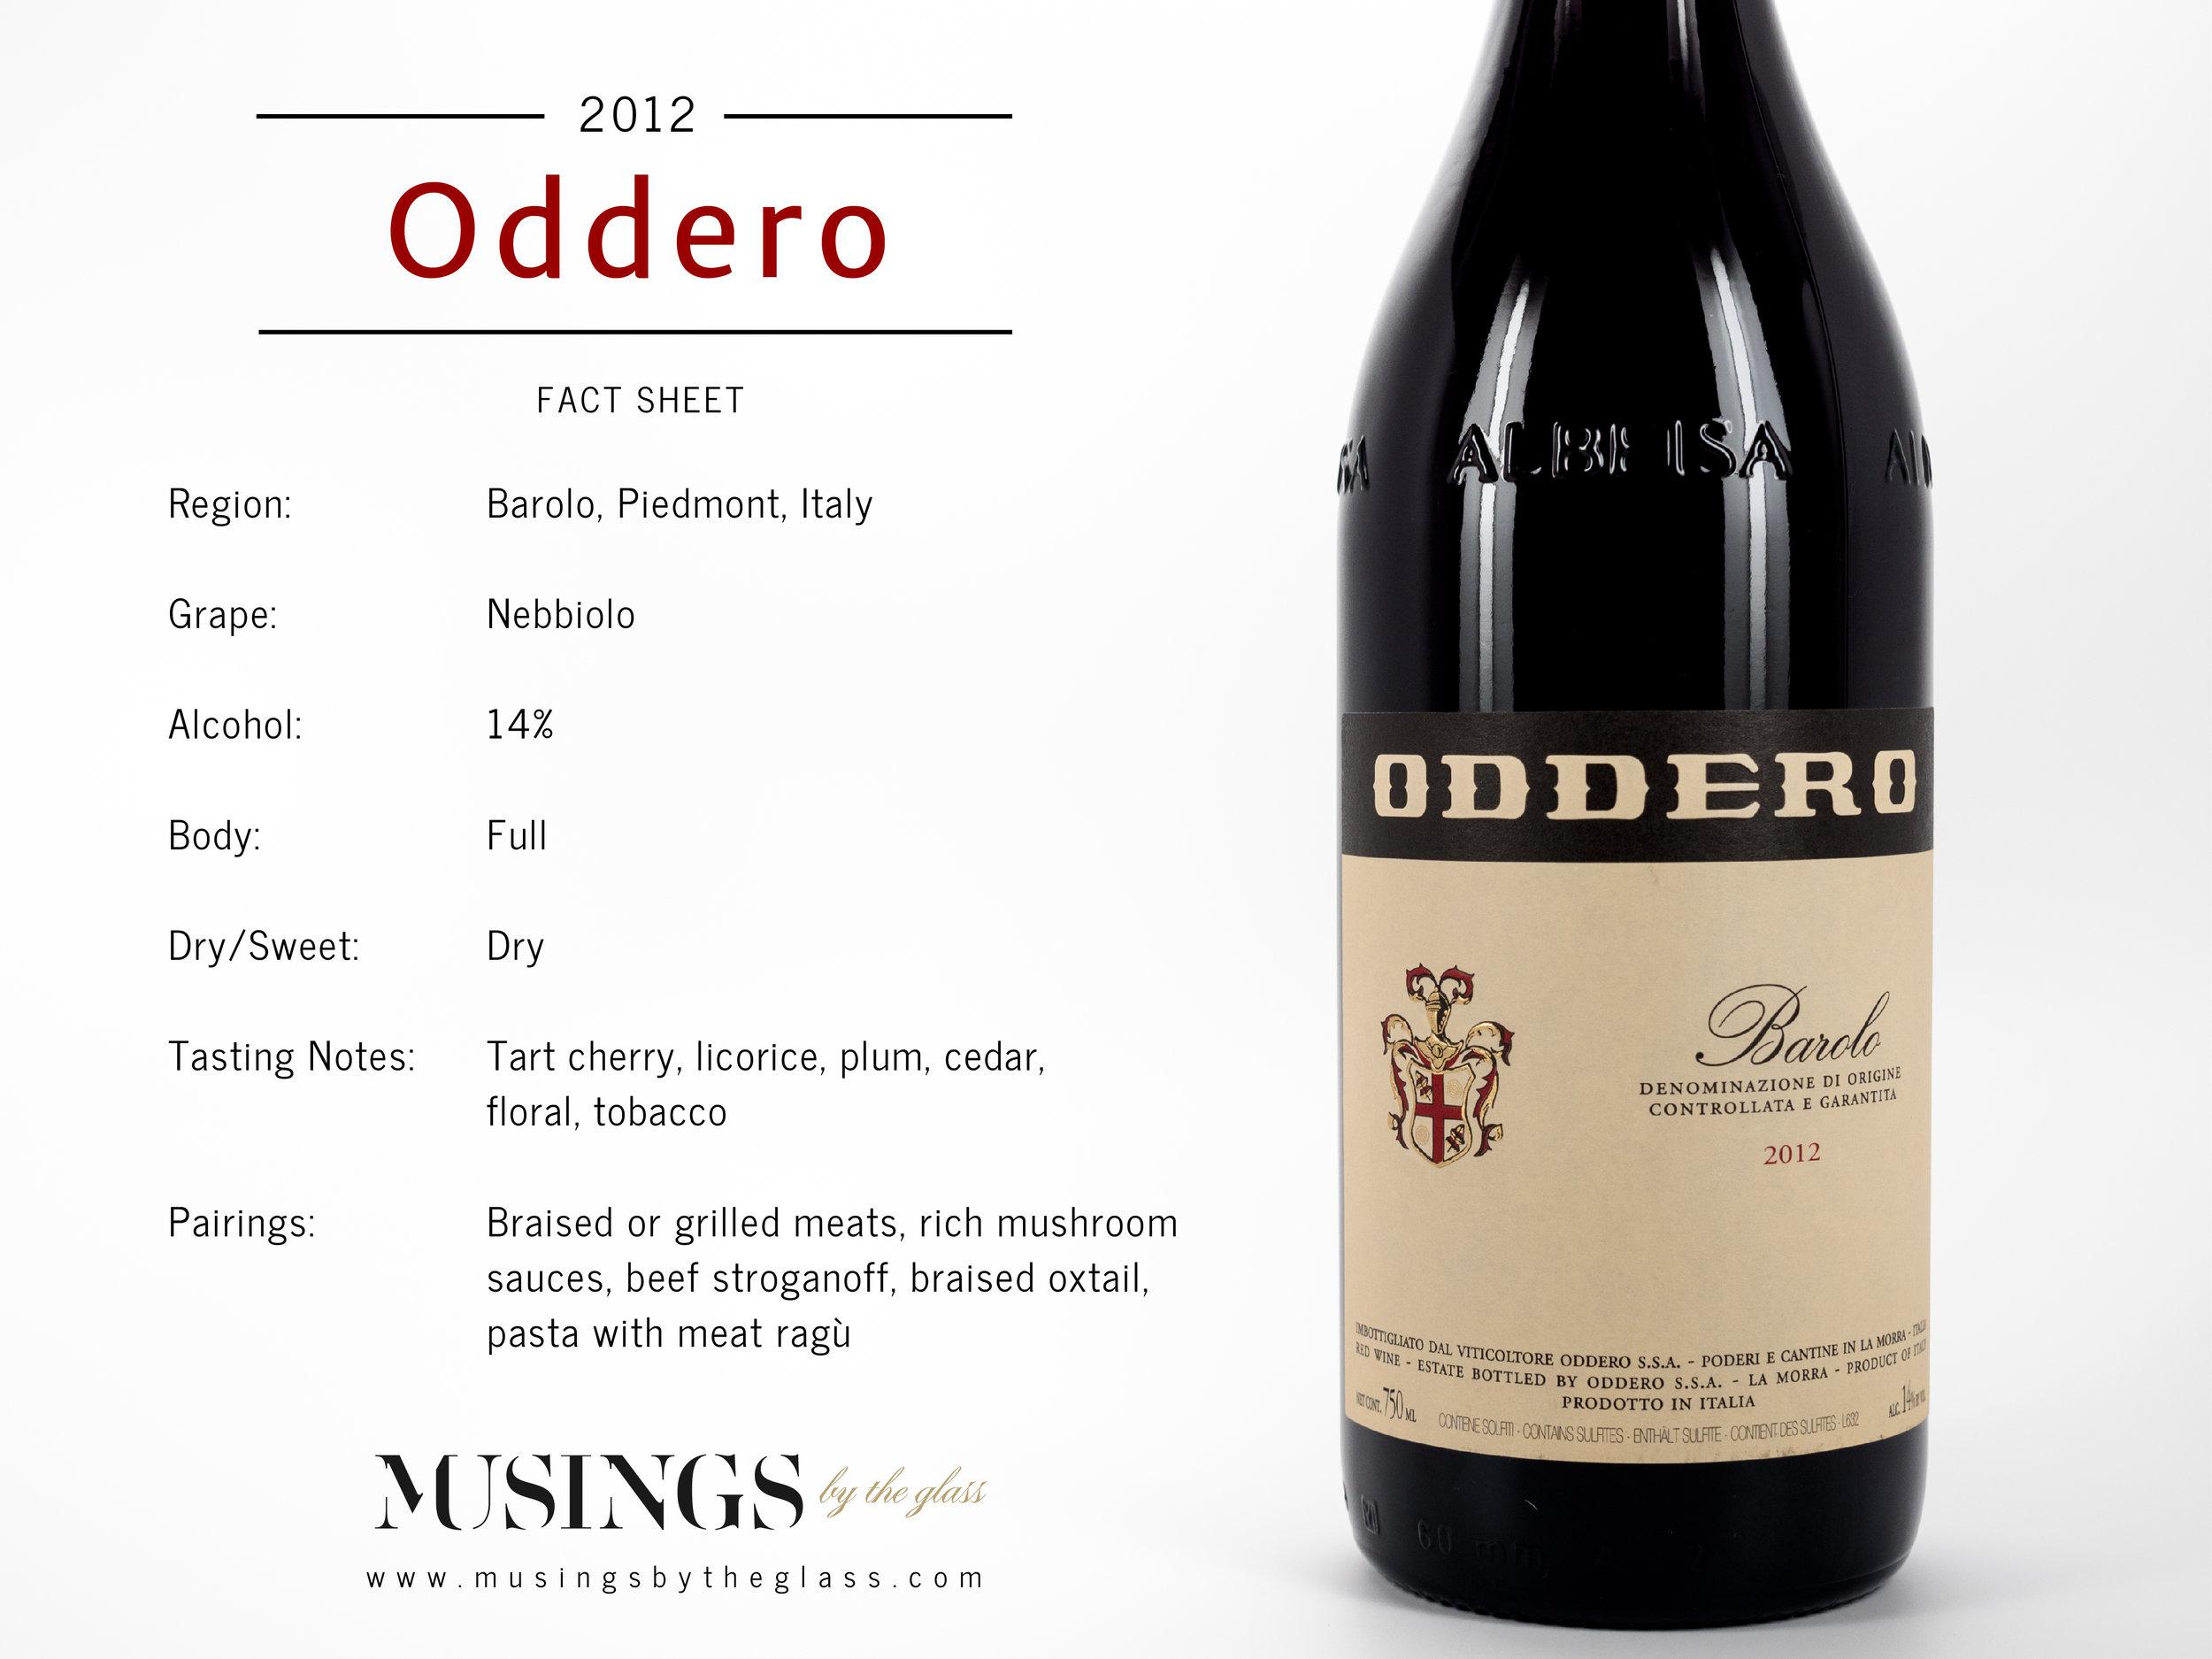 Musings by the Glass - Vino Pairing Optimization - 2012 Oddero Barolo Fact Sheet